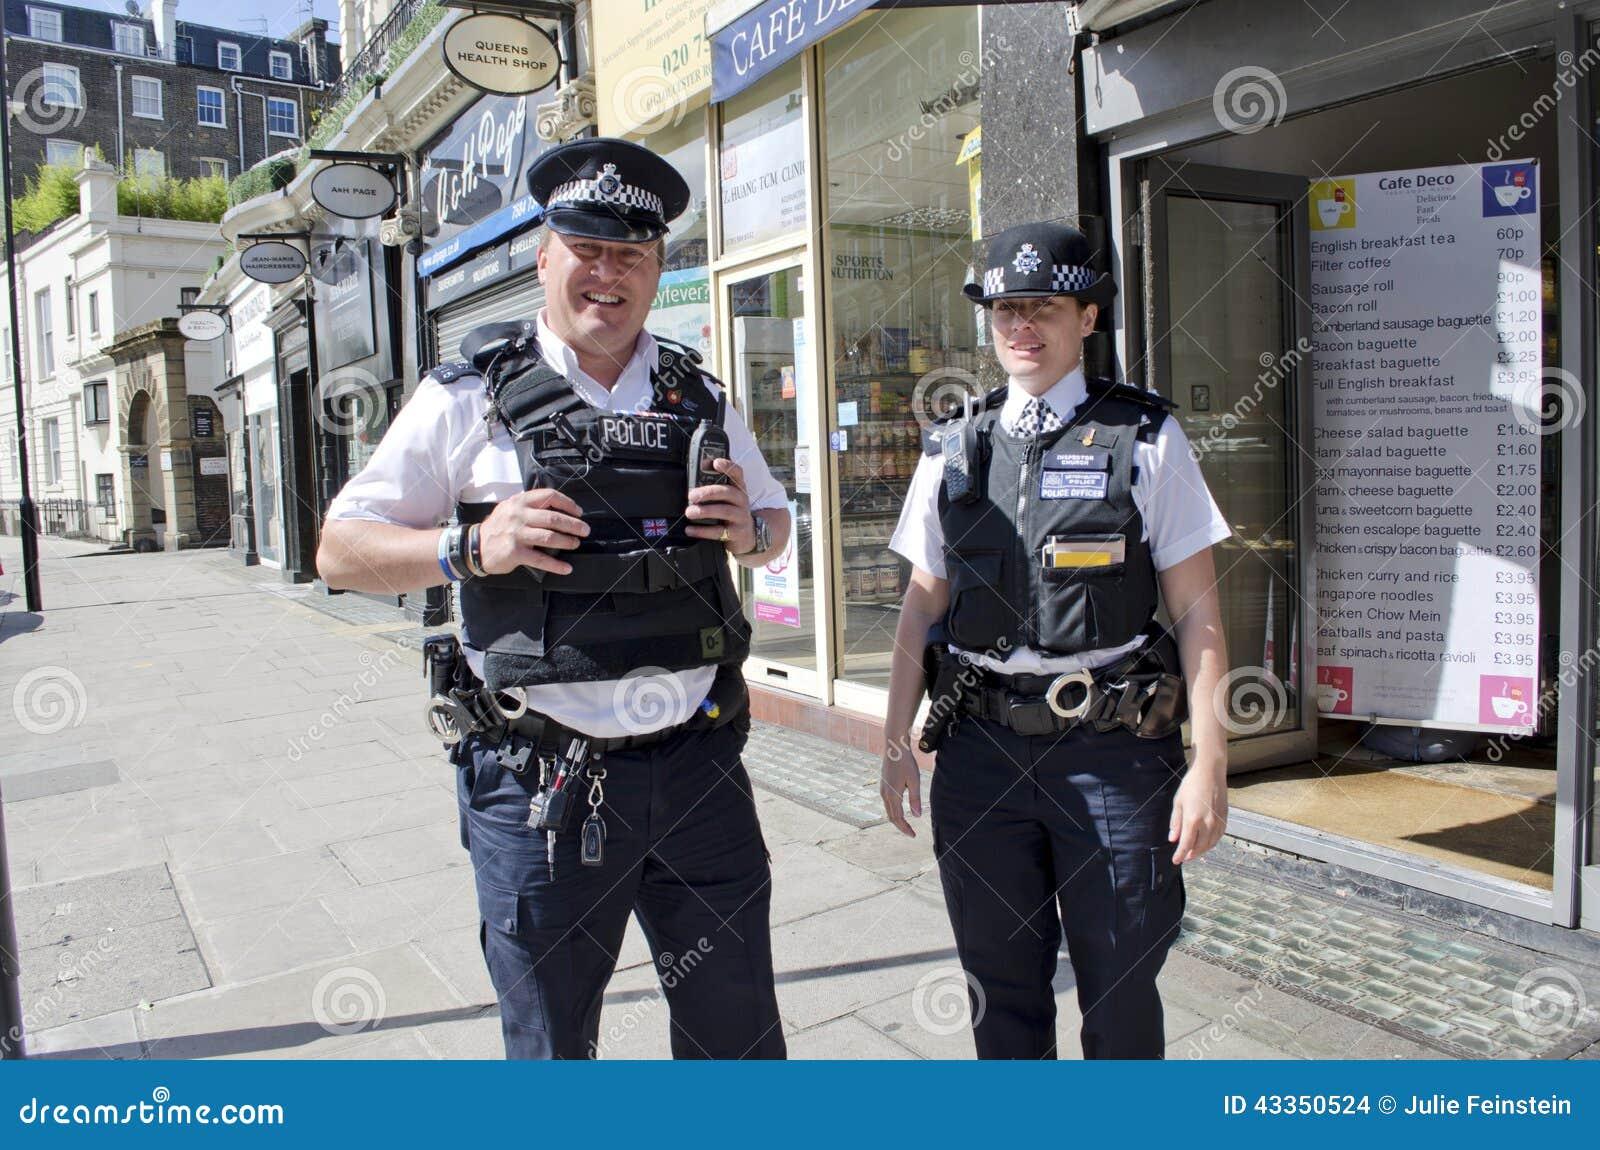 London Police Editorial Stock Image - Image: 43350524